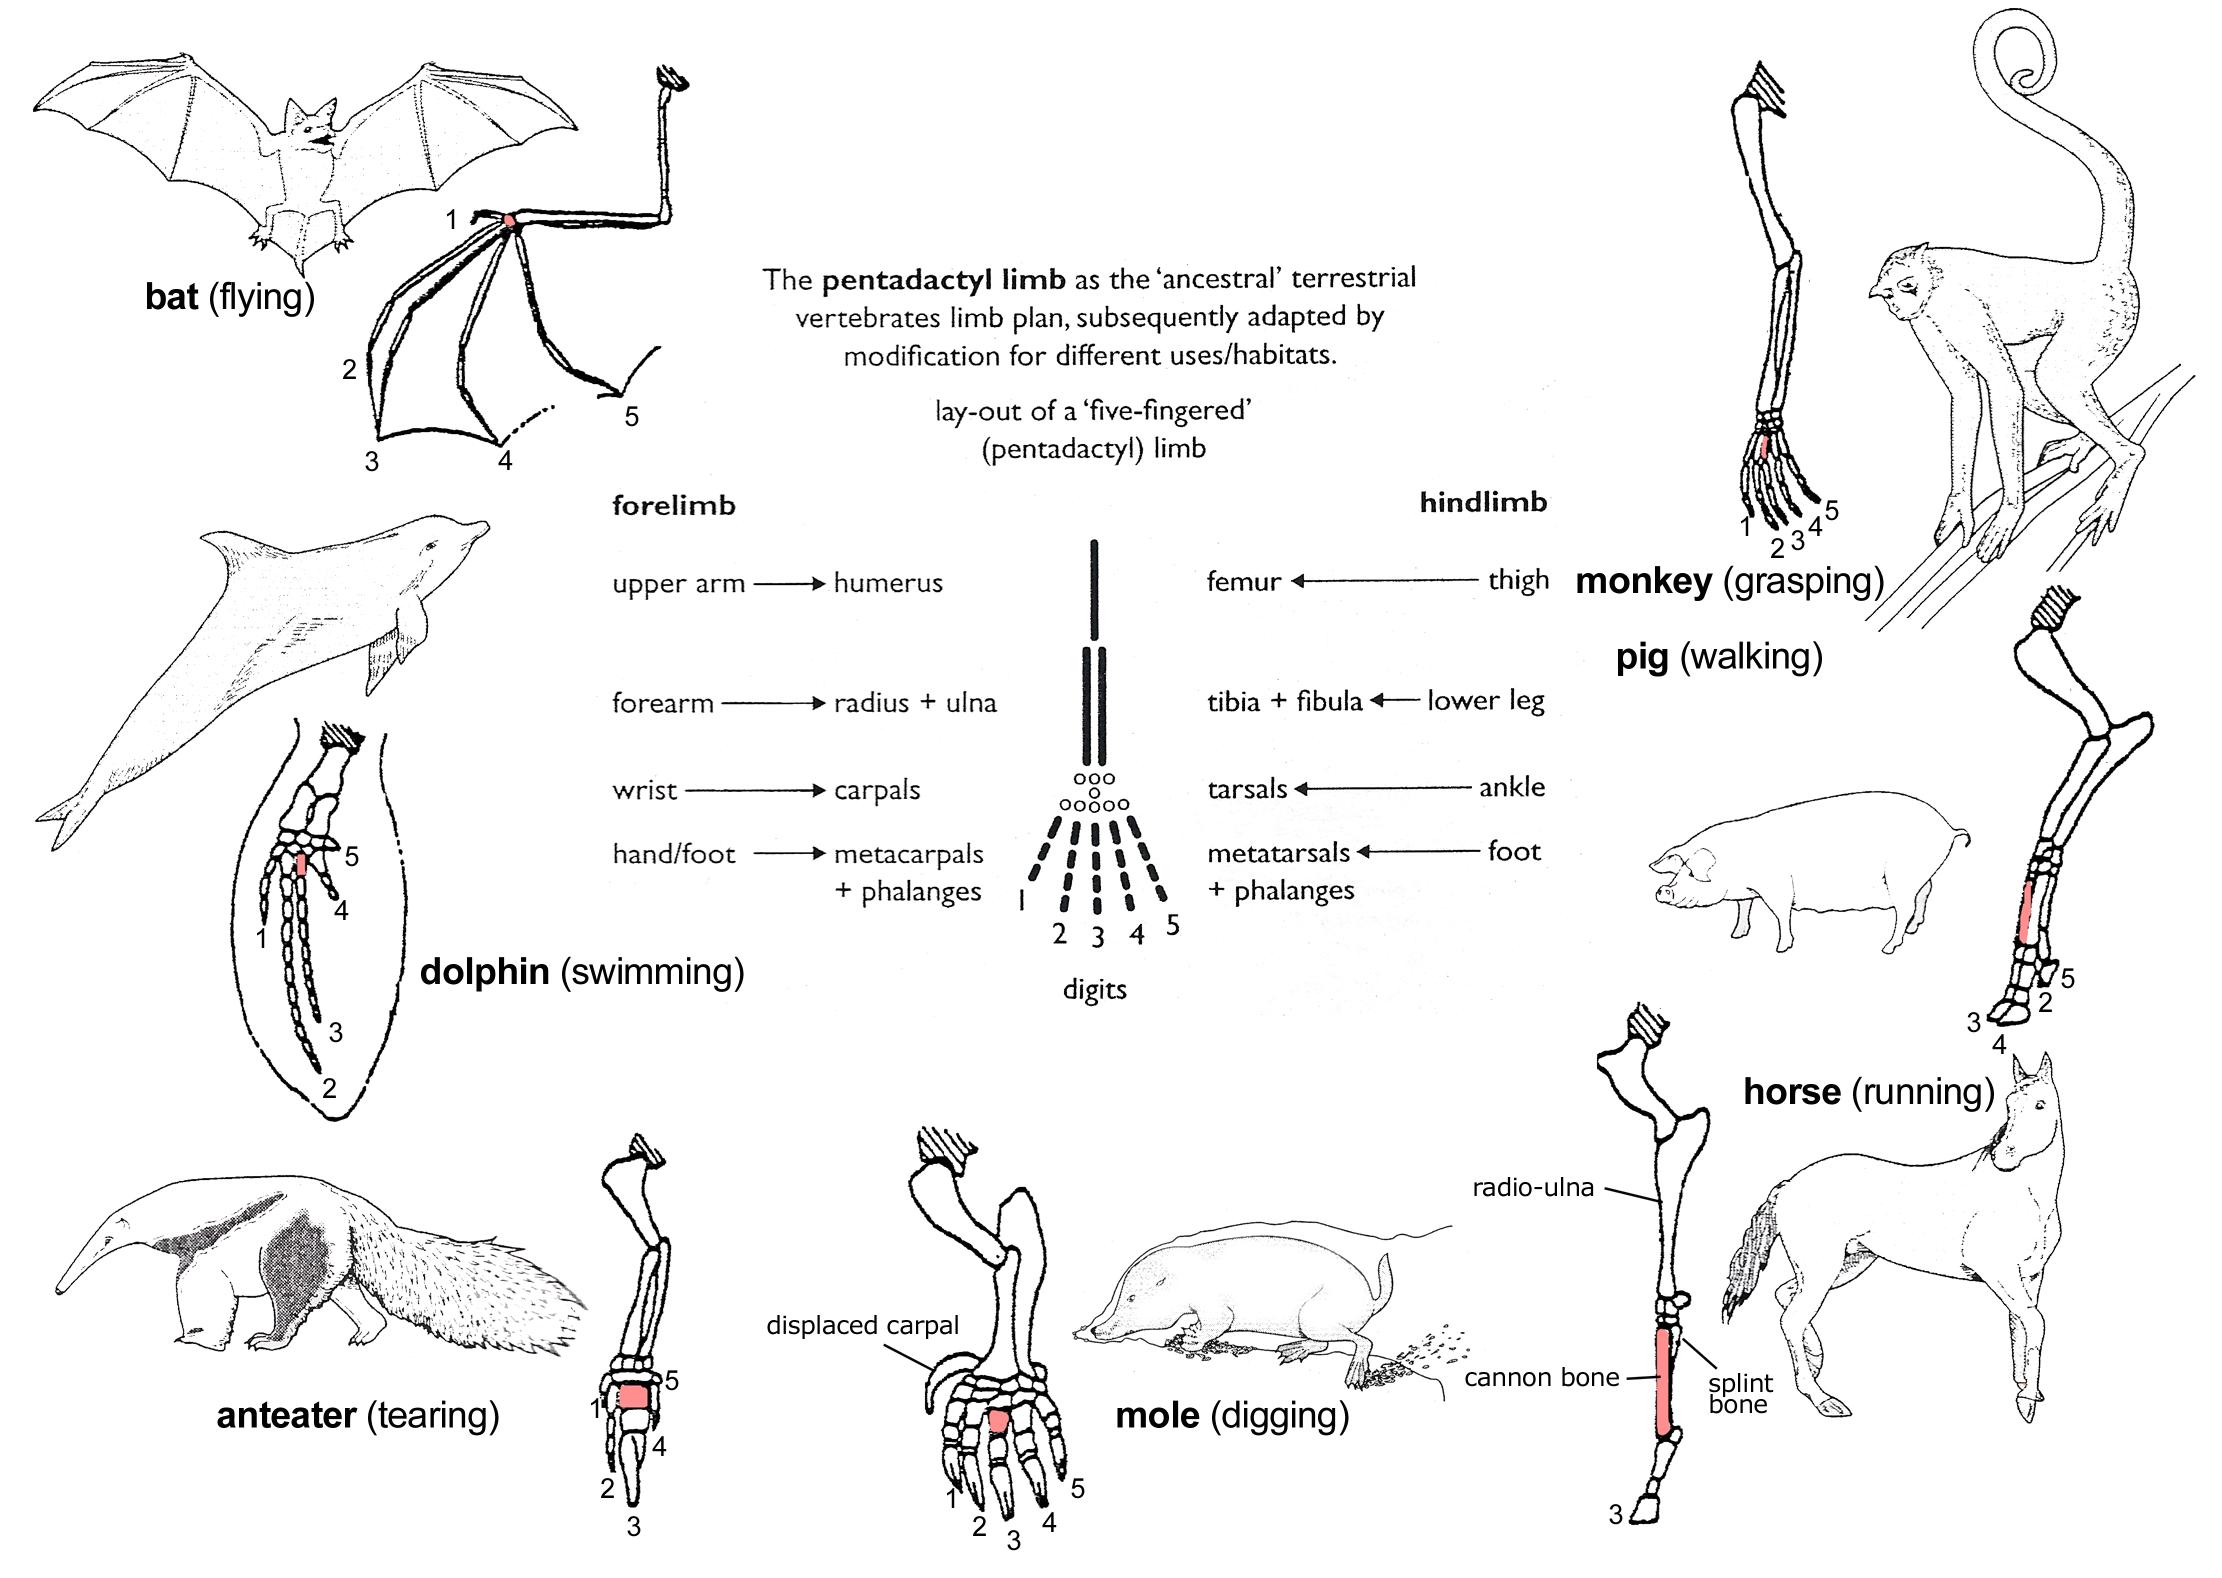 worksheet. Comparative Anatomy Worksheet. Carlos Lomas Worksheet For ...